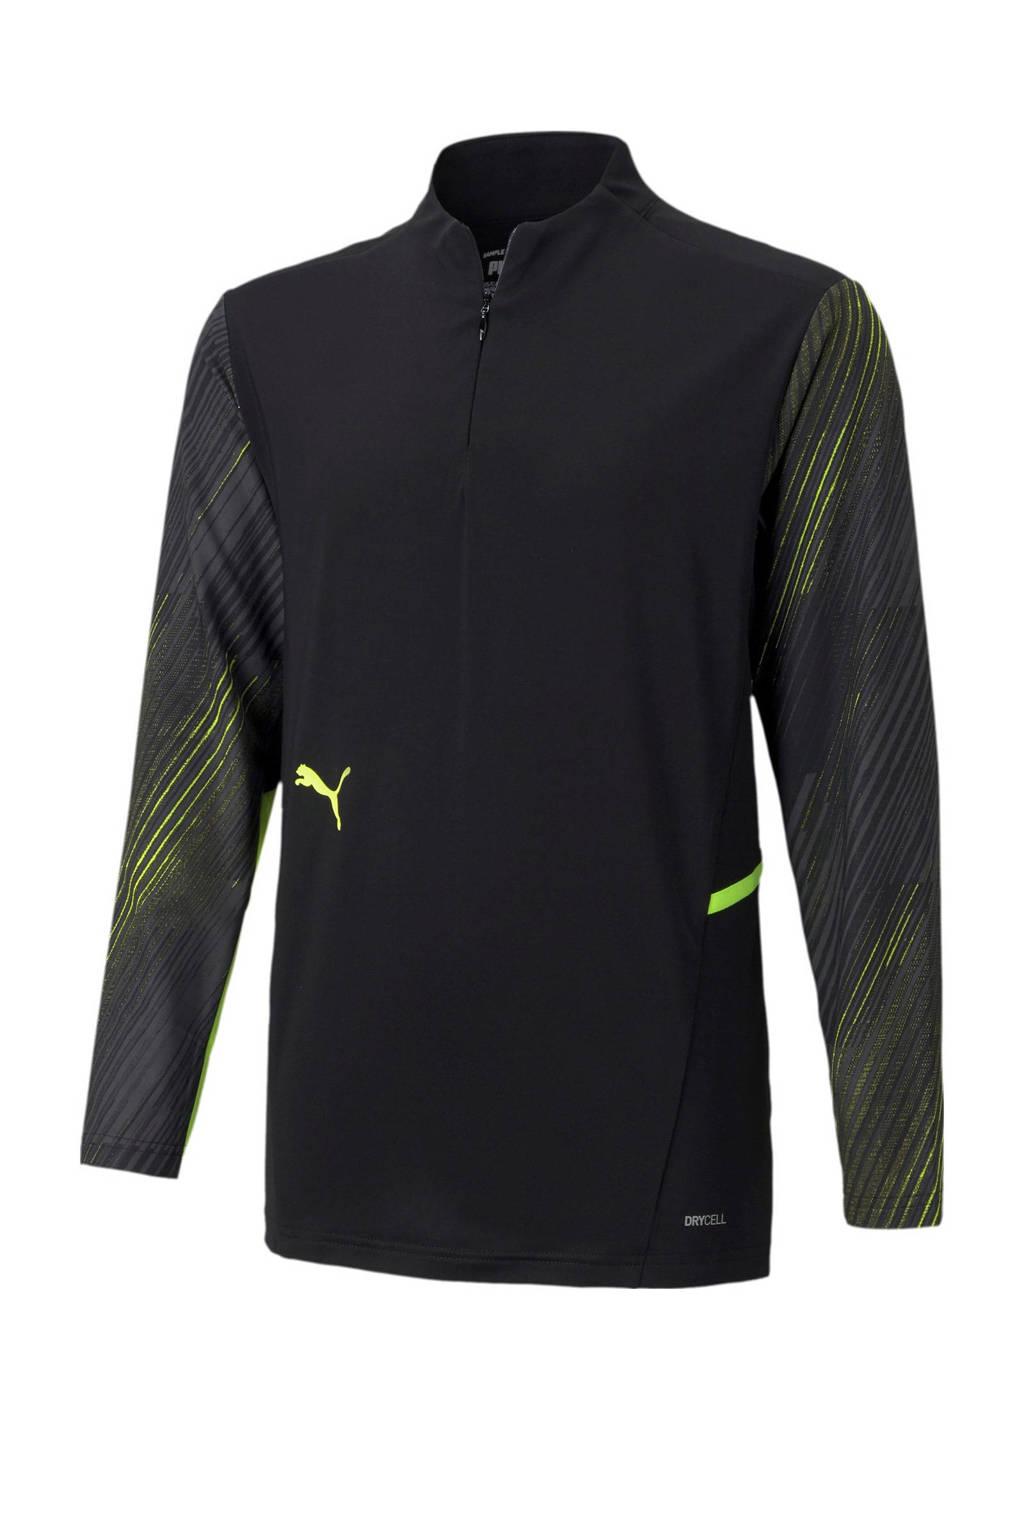 Puma Junior  voetbalshirt zwart/geel, Zwart/geel